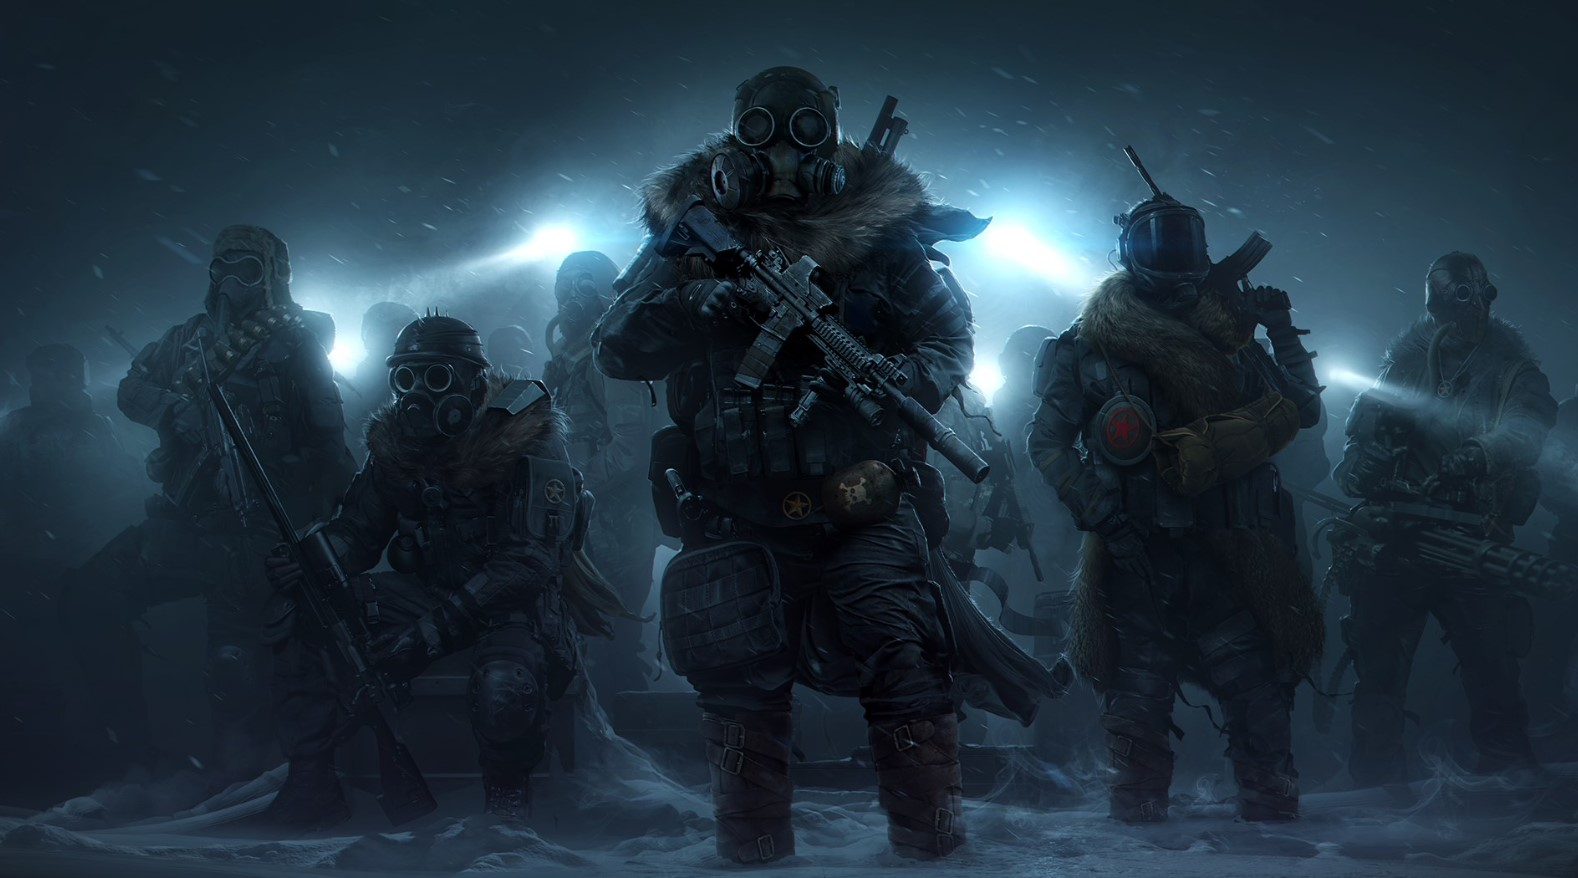 Релизы Wasteland 3 иMinecraft Dungeons перенесли: когда выйдут эти игры